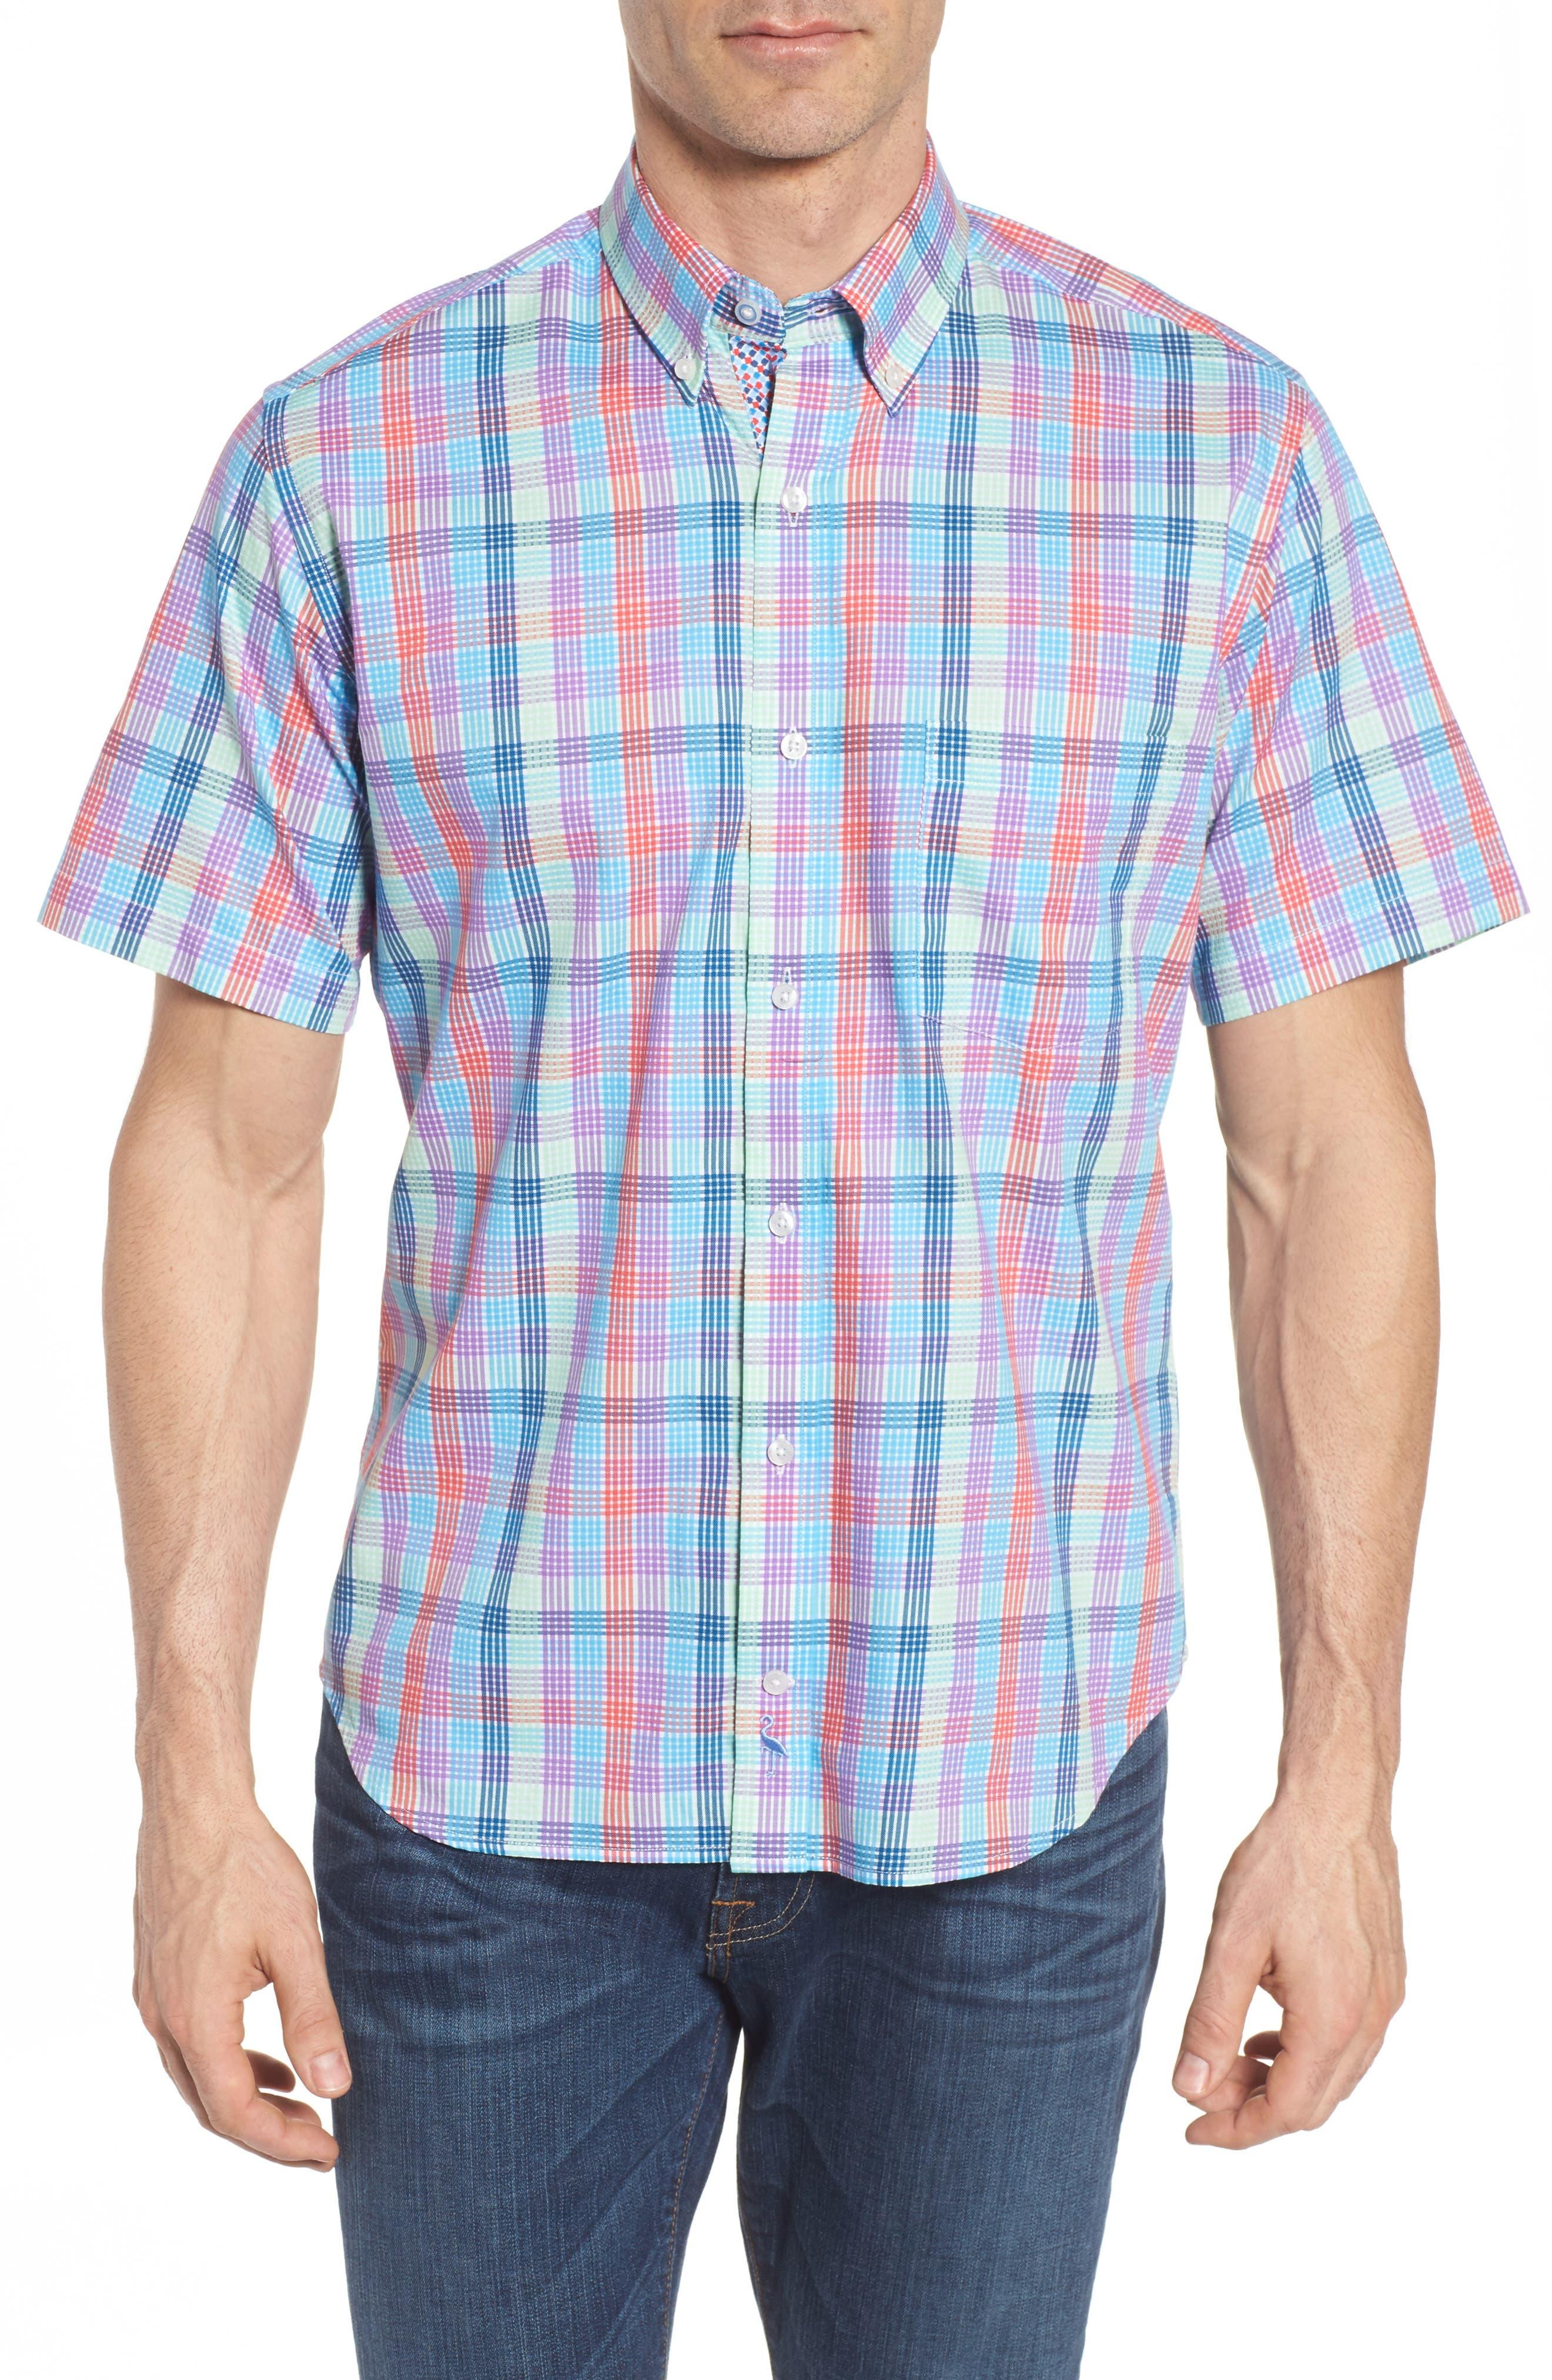 Alternate Image 1 Selected - TailorByrd Slidell Regular Fit Check Sport Shirt